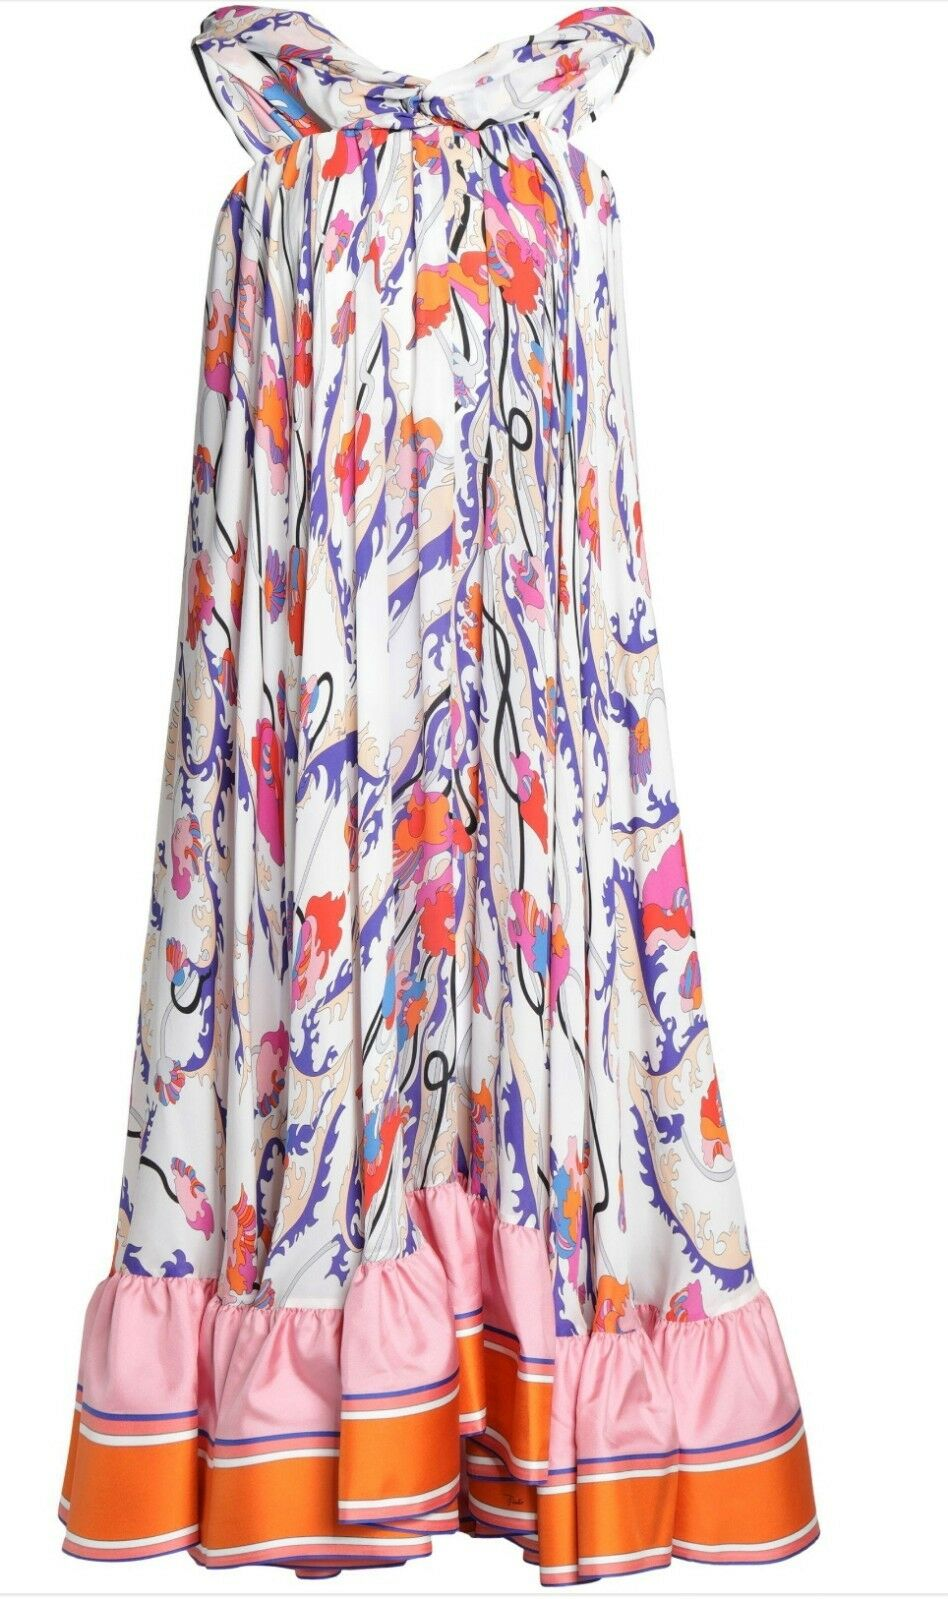 Emilio pucci Asymmetric Print Silk dress